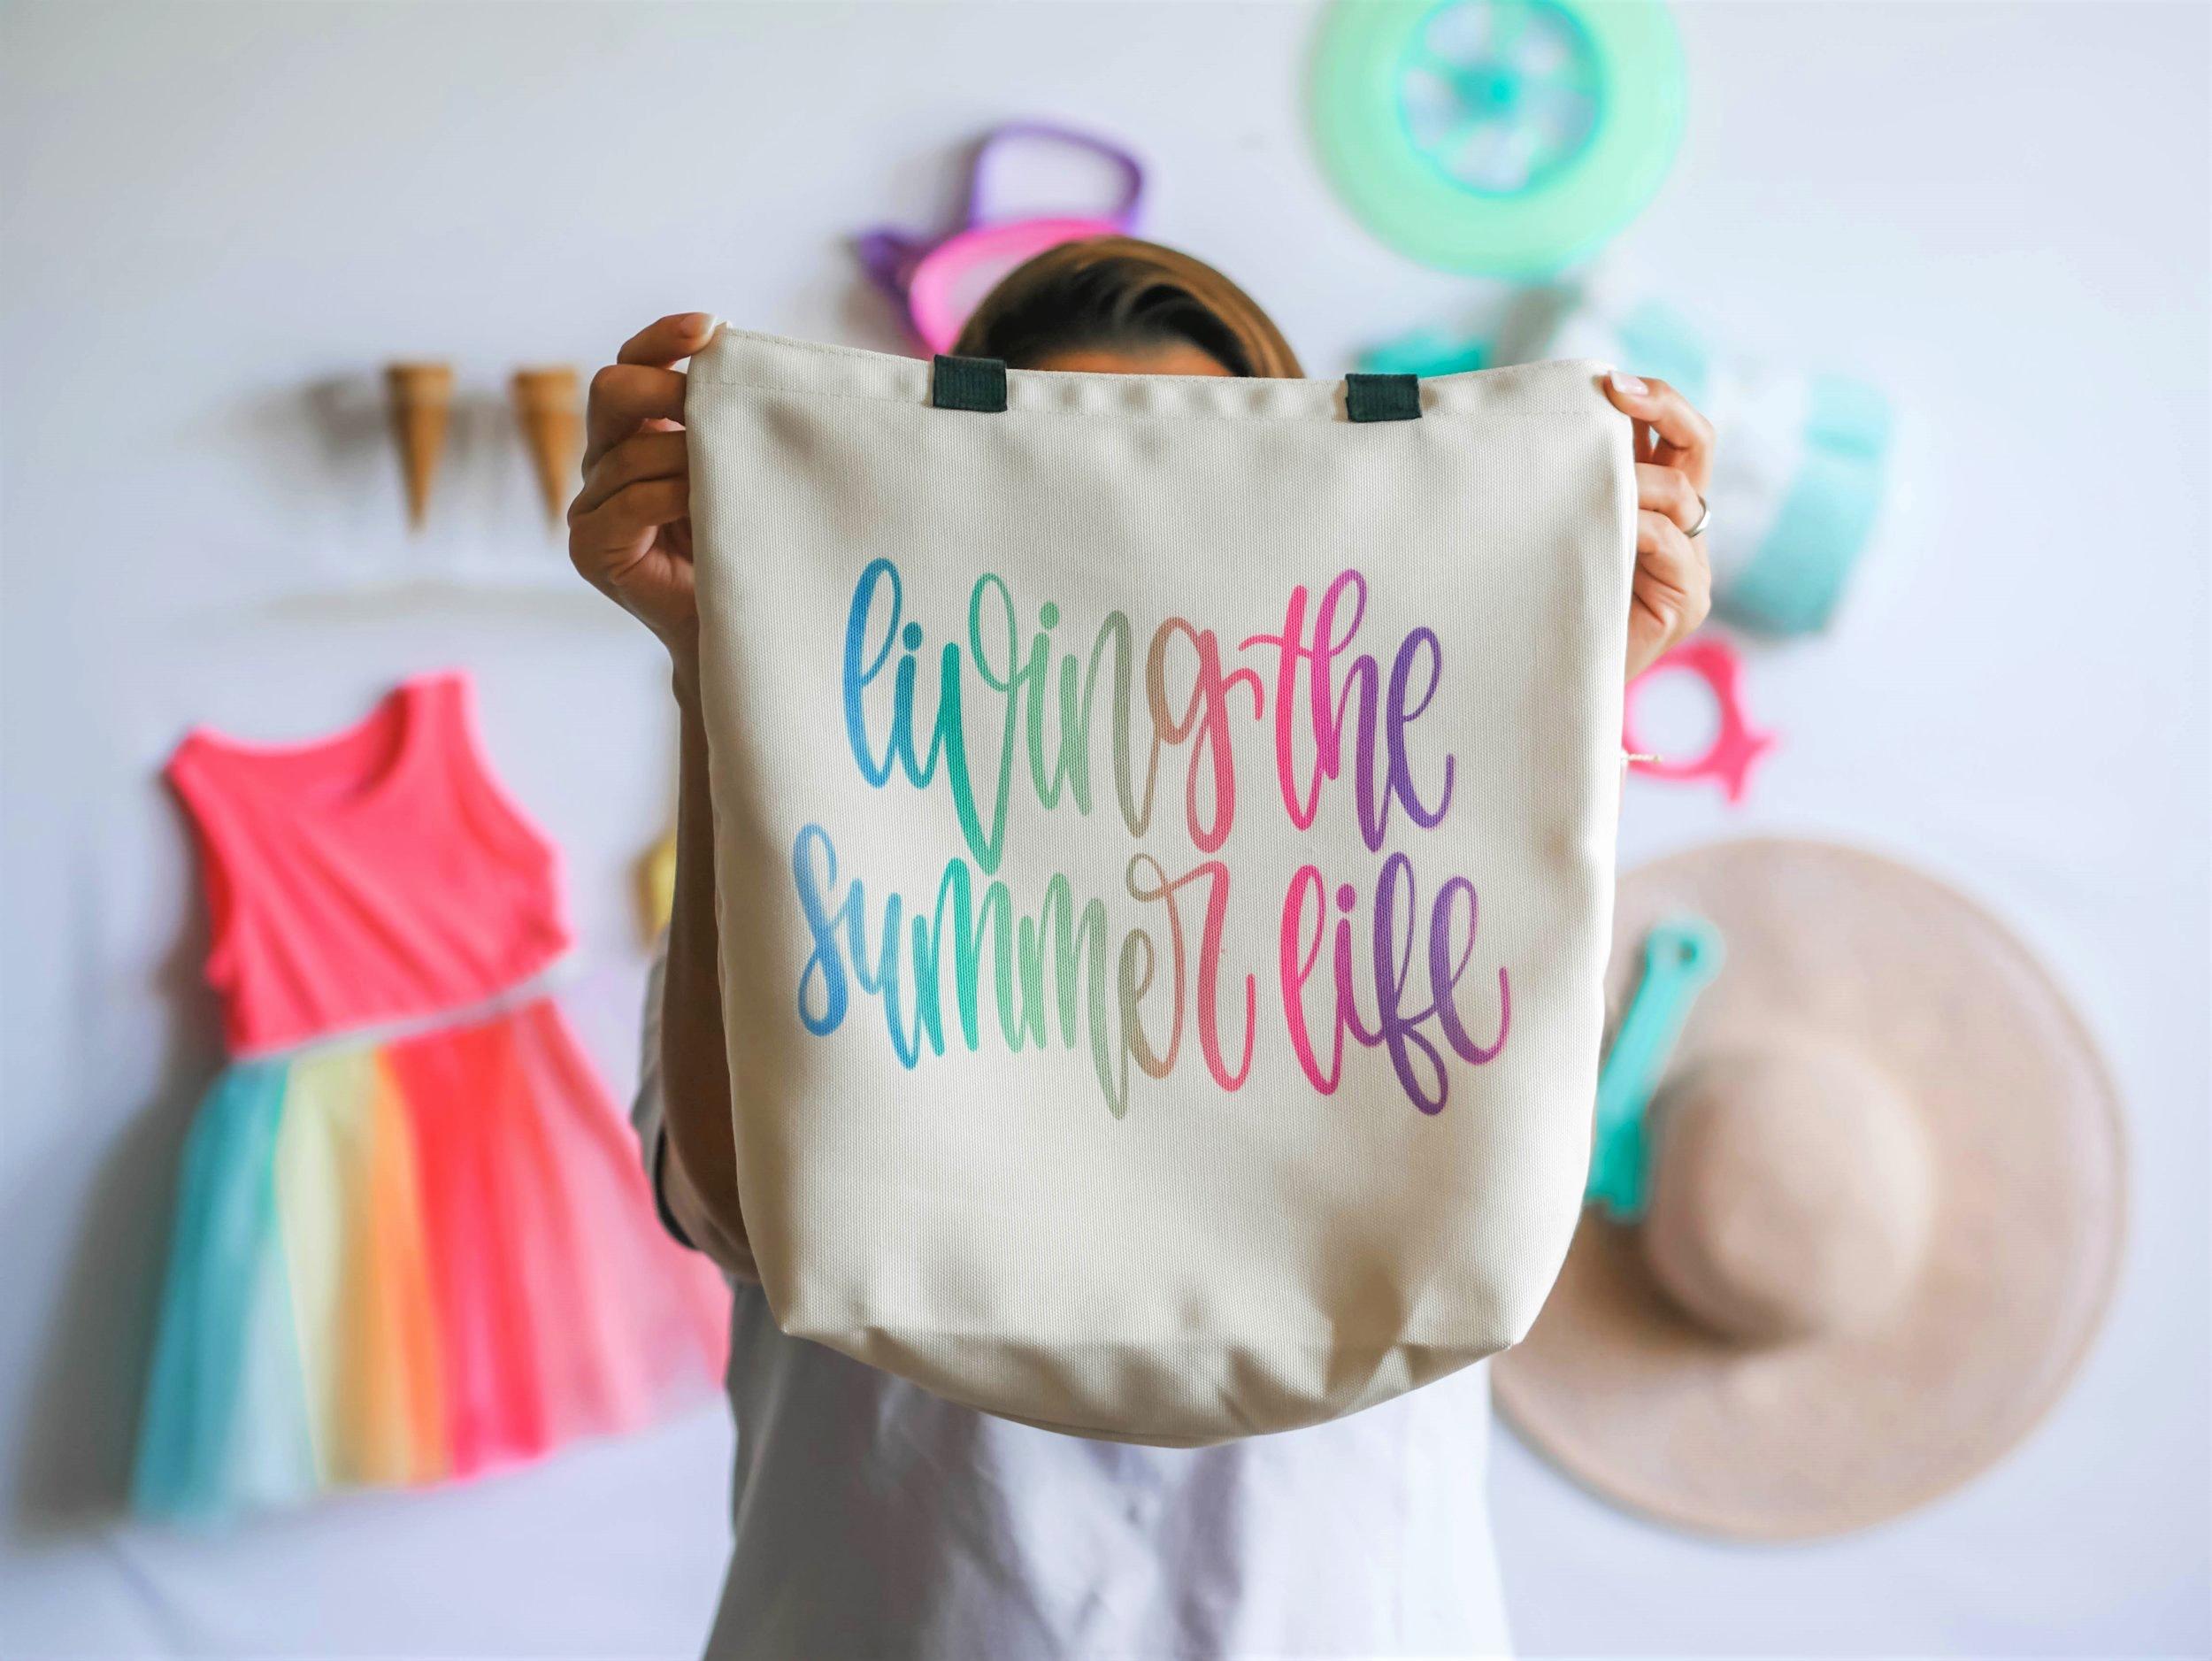 Cricut Infusible Ink DIY, SUmmer DIY, Cricut DIY, Tote bag idea for summer, Infusible Ink, summer craft, girls craft idea